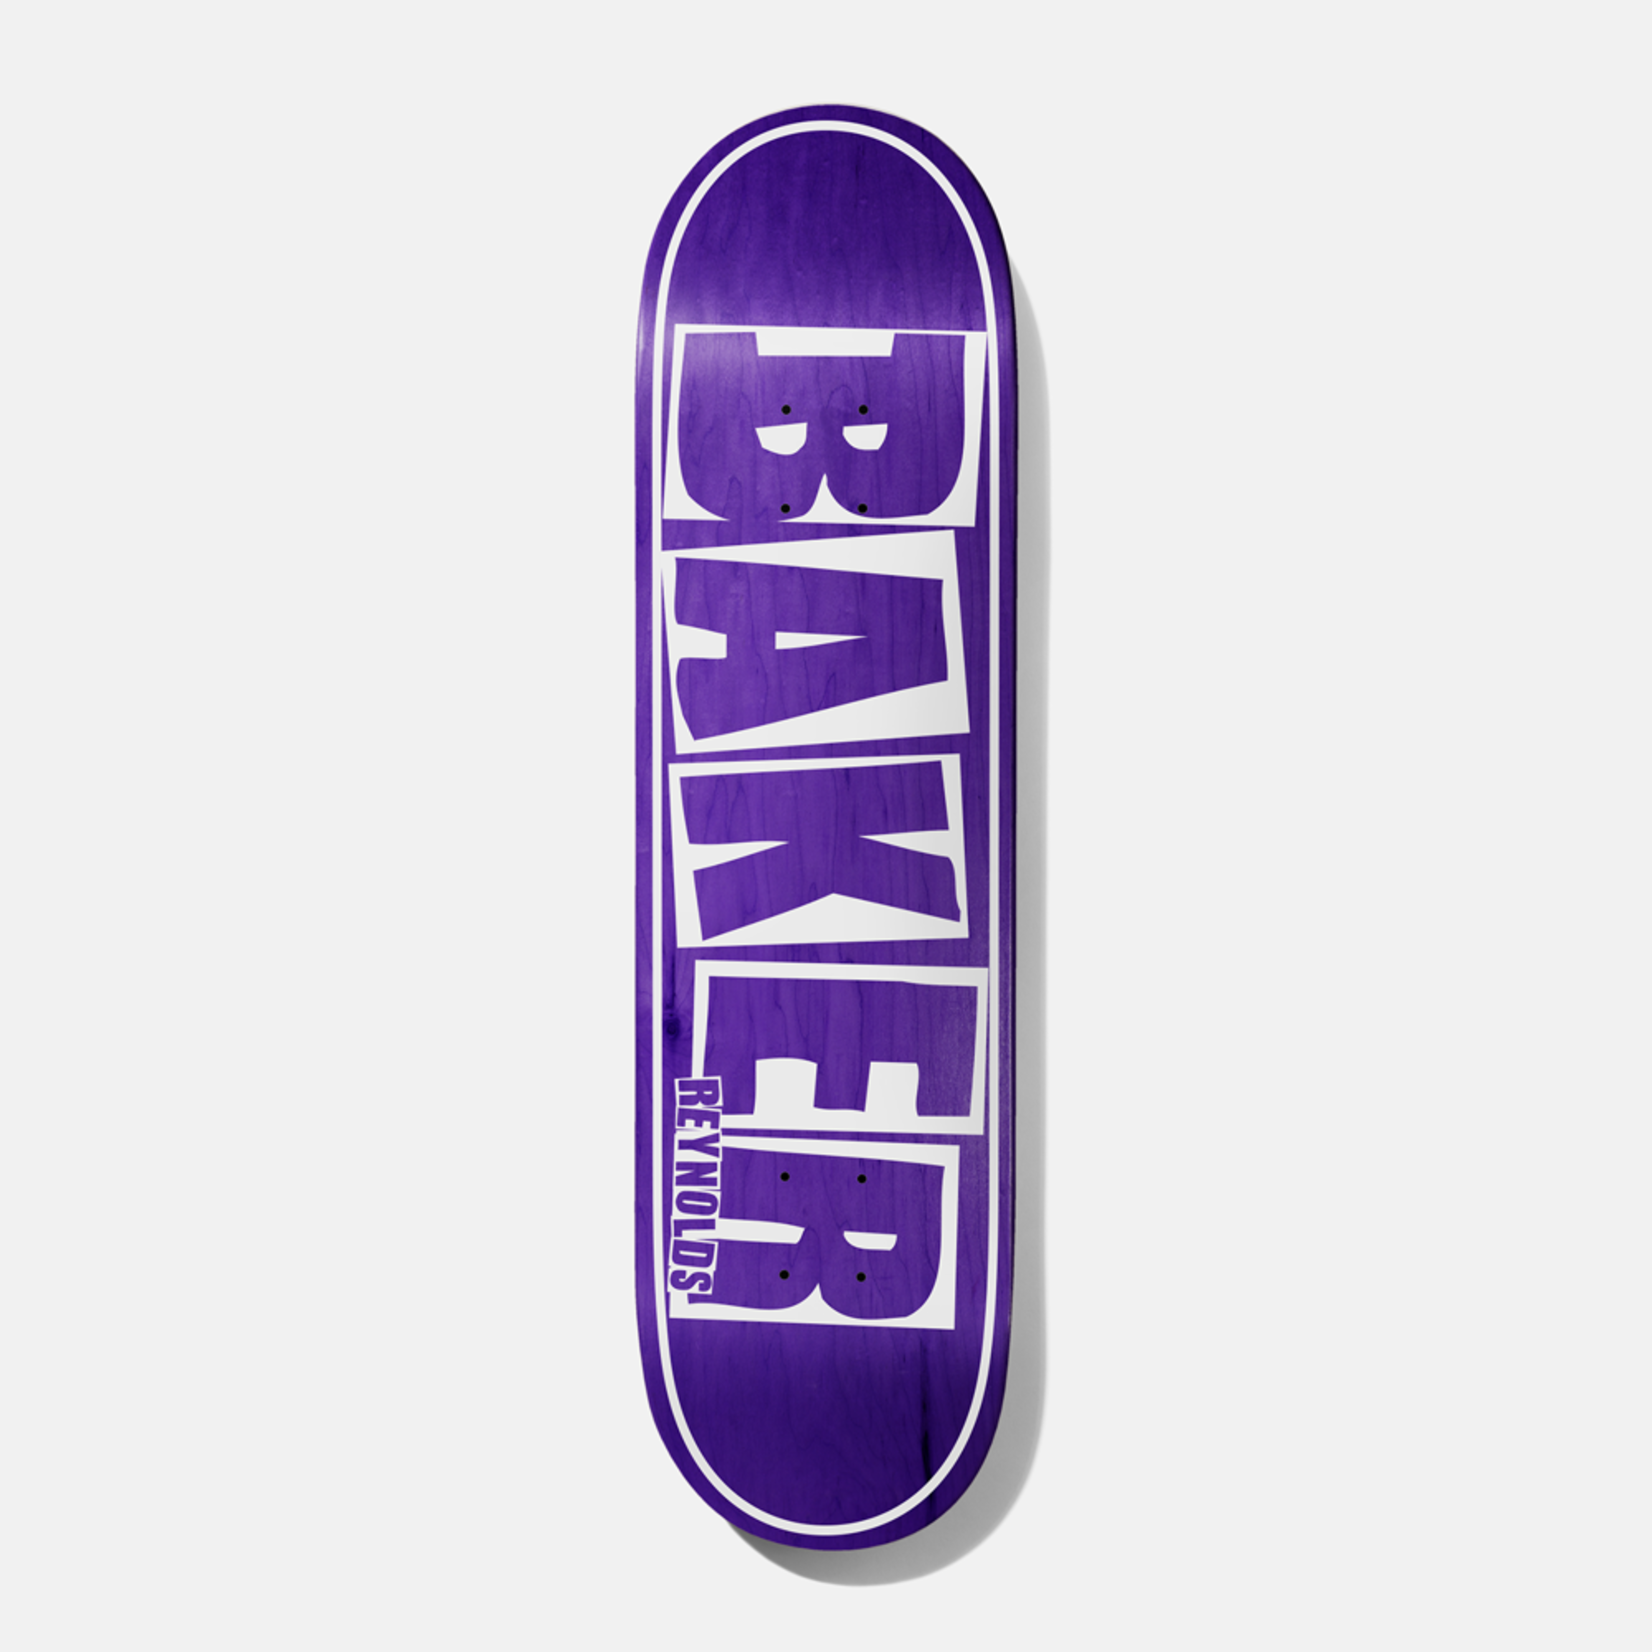 Baker Baker Reynolds Brand Name Deck, Purple, 8.12